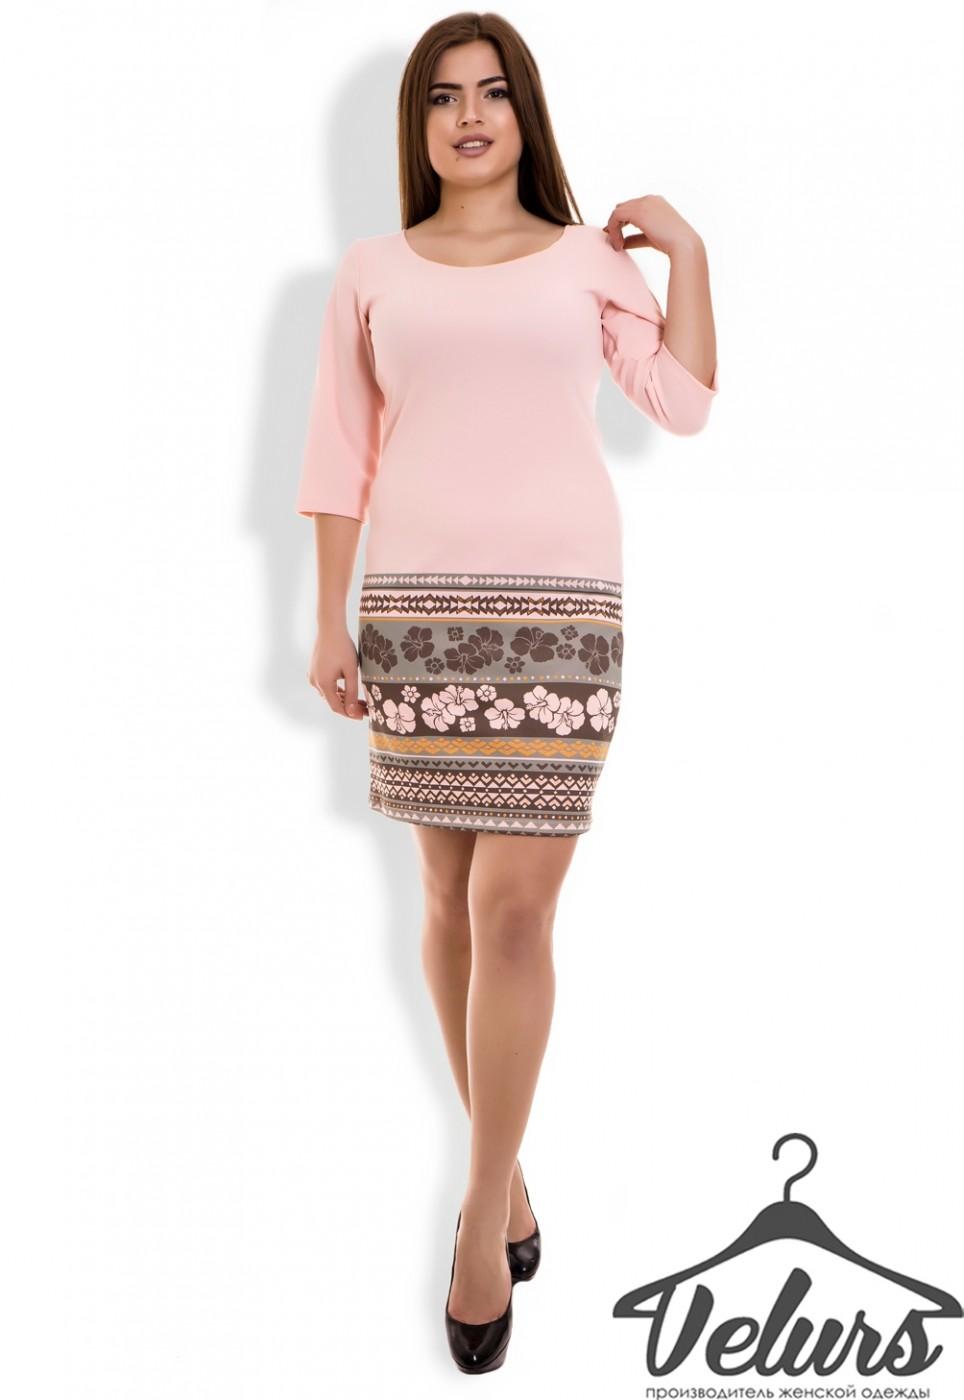 Velurs: Платье 212130 - фото 1